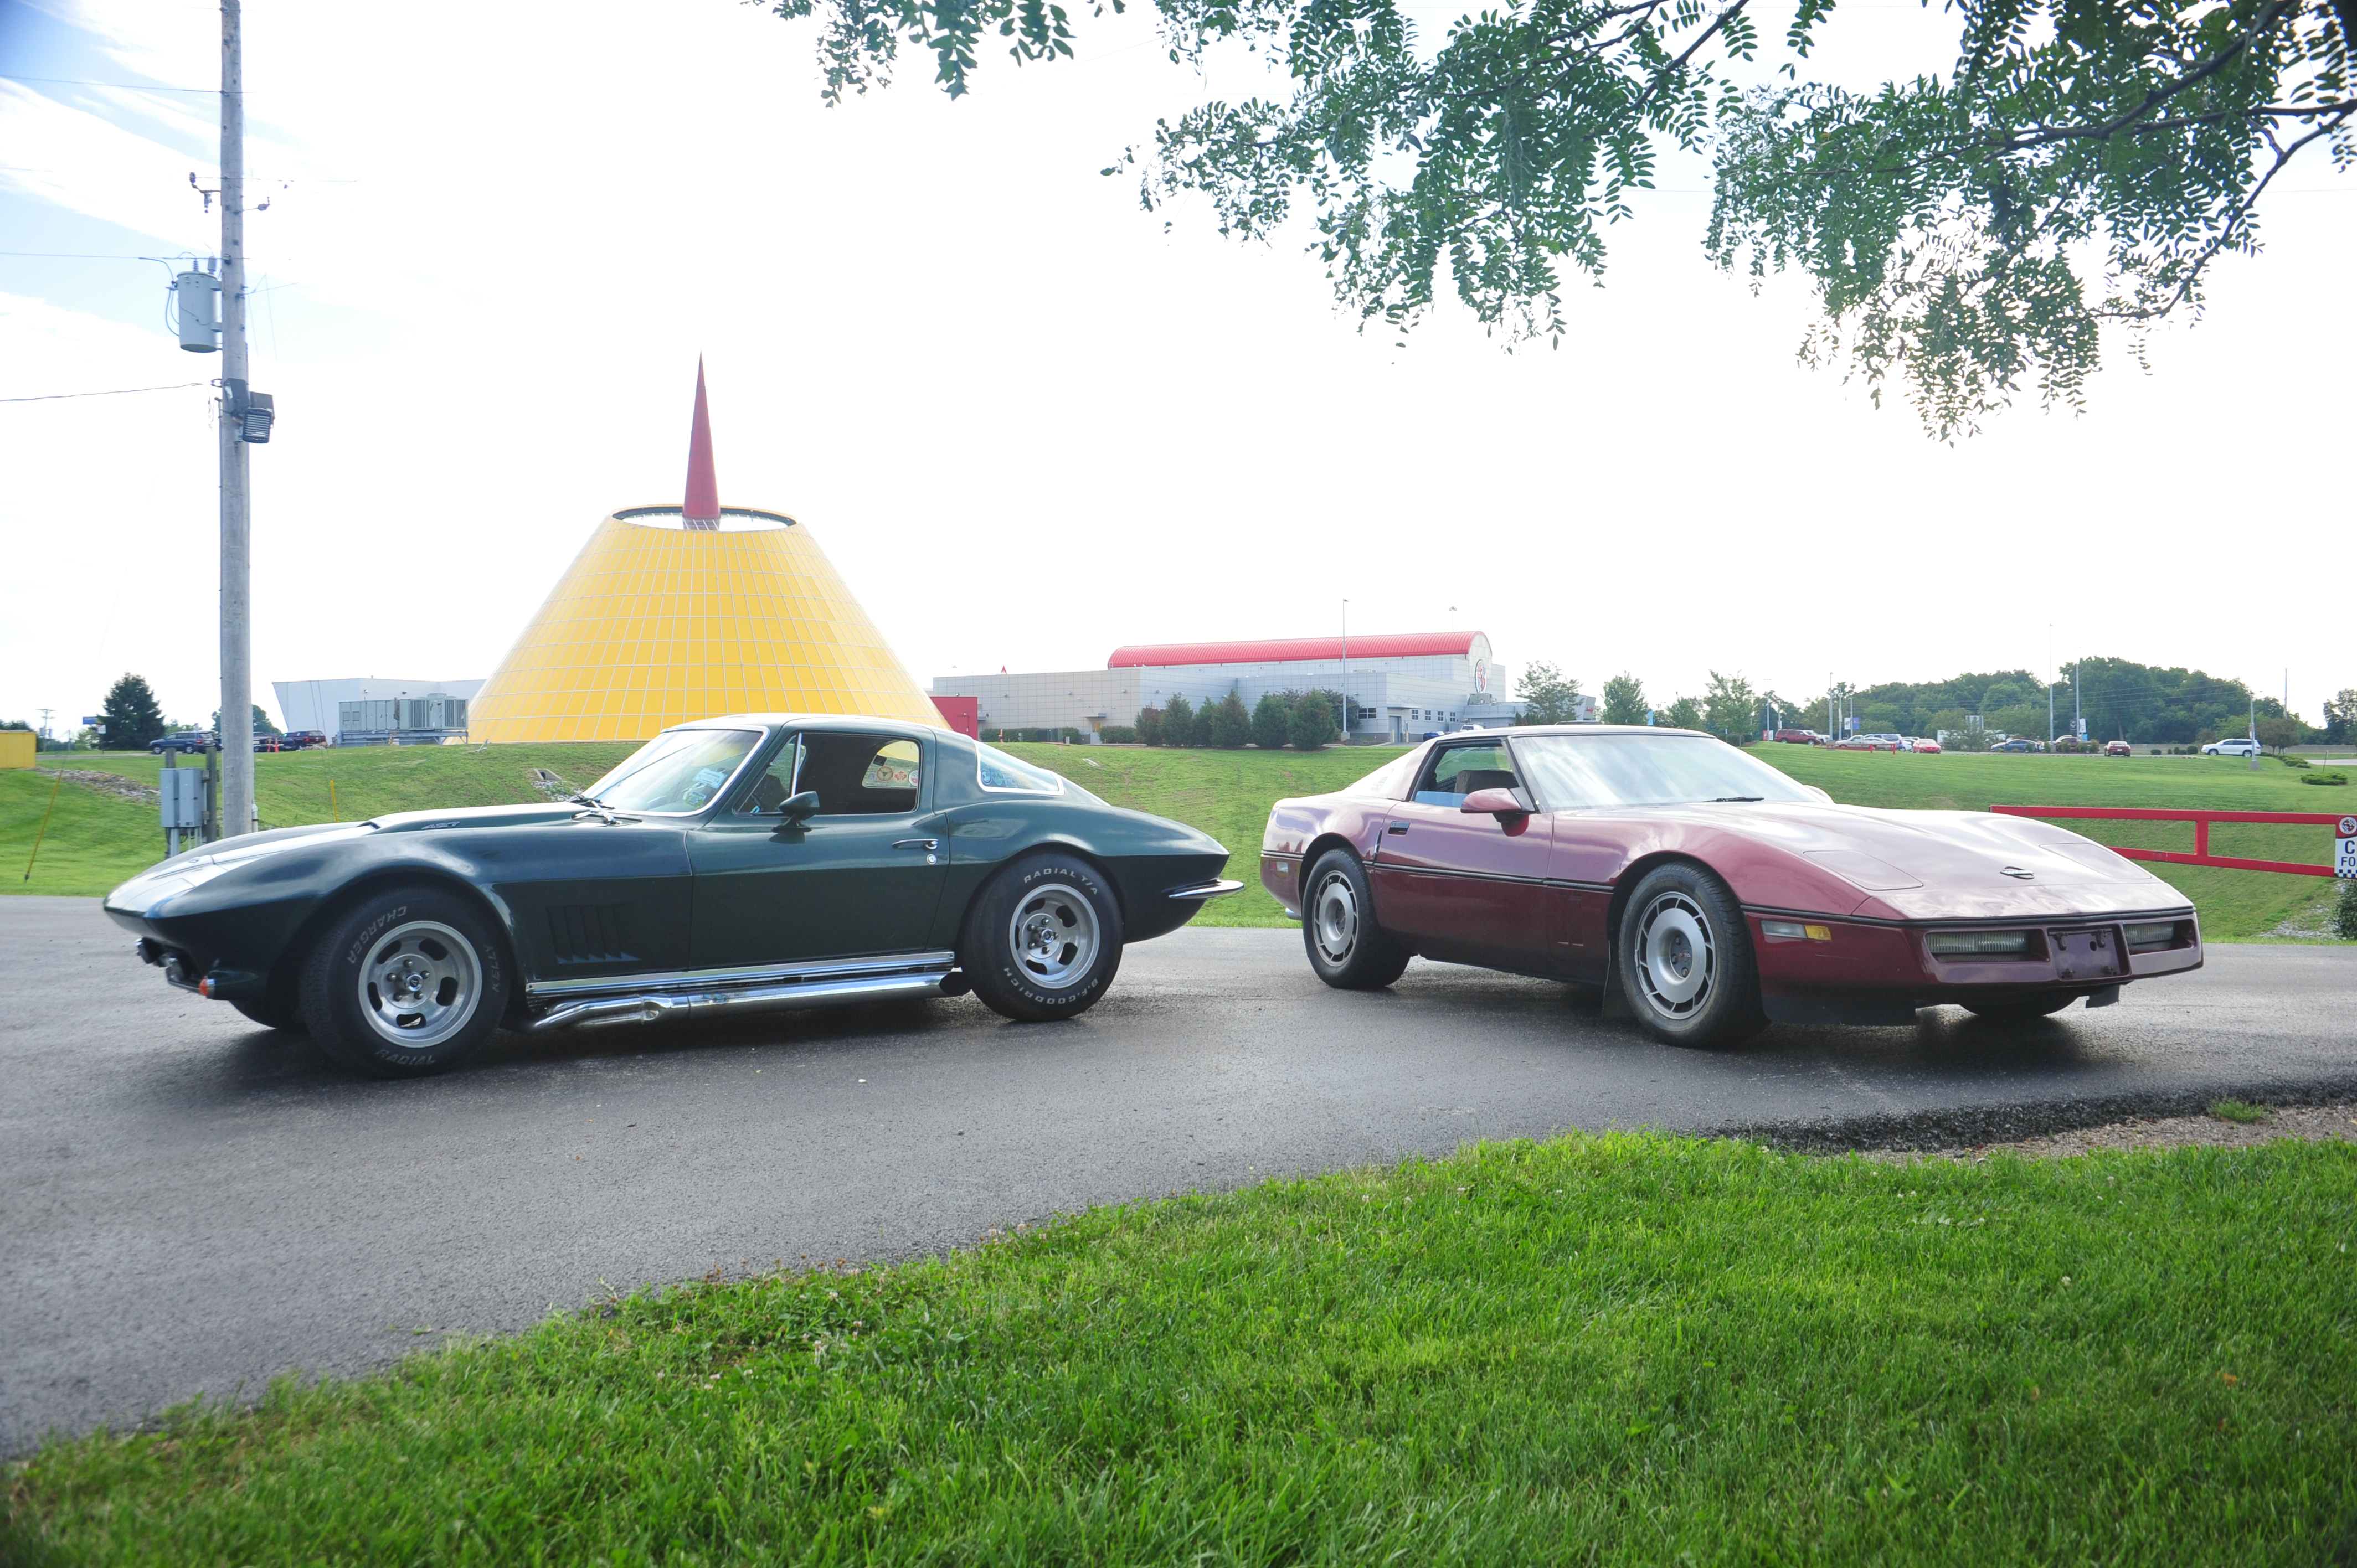 Bill Engle's 1967 and 1987 Corvettes